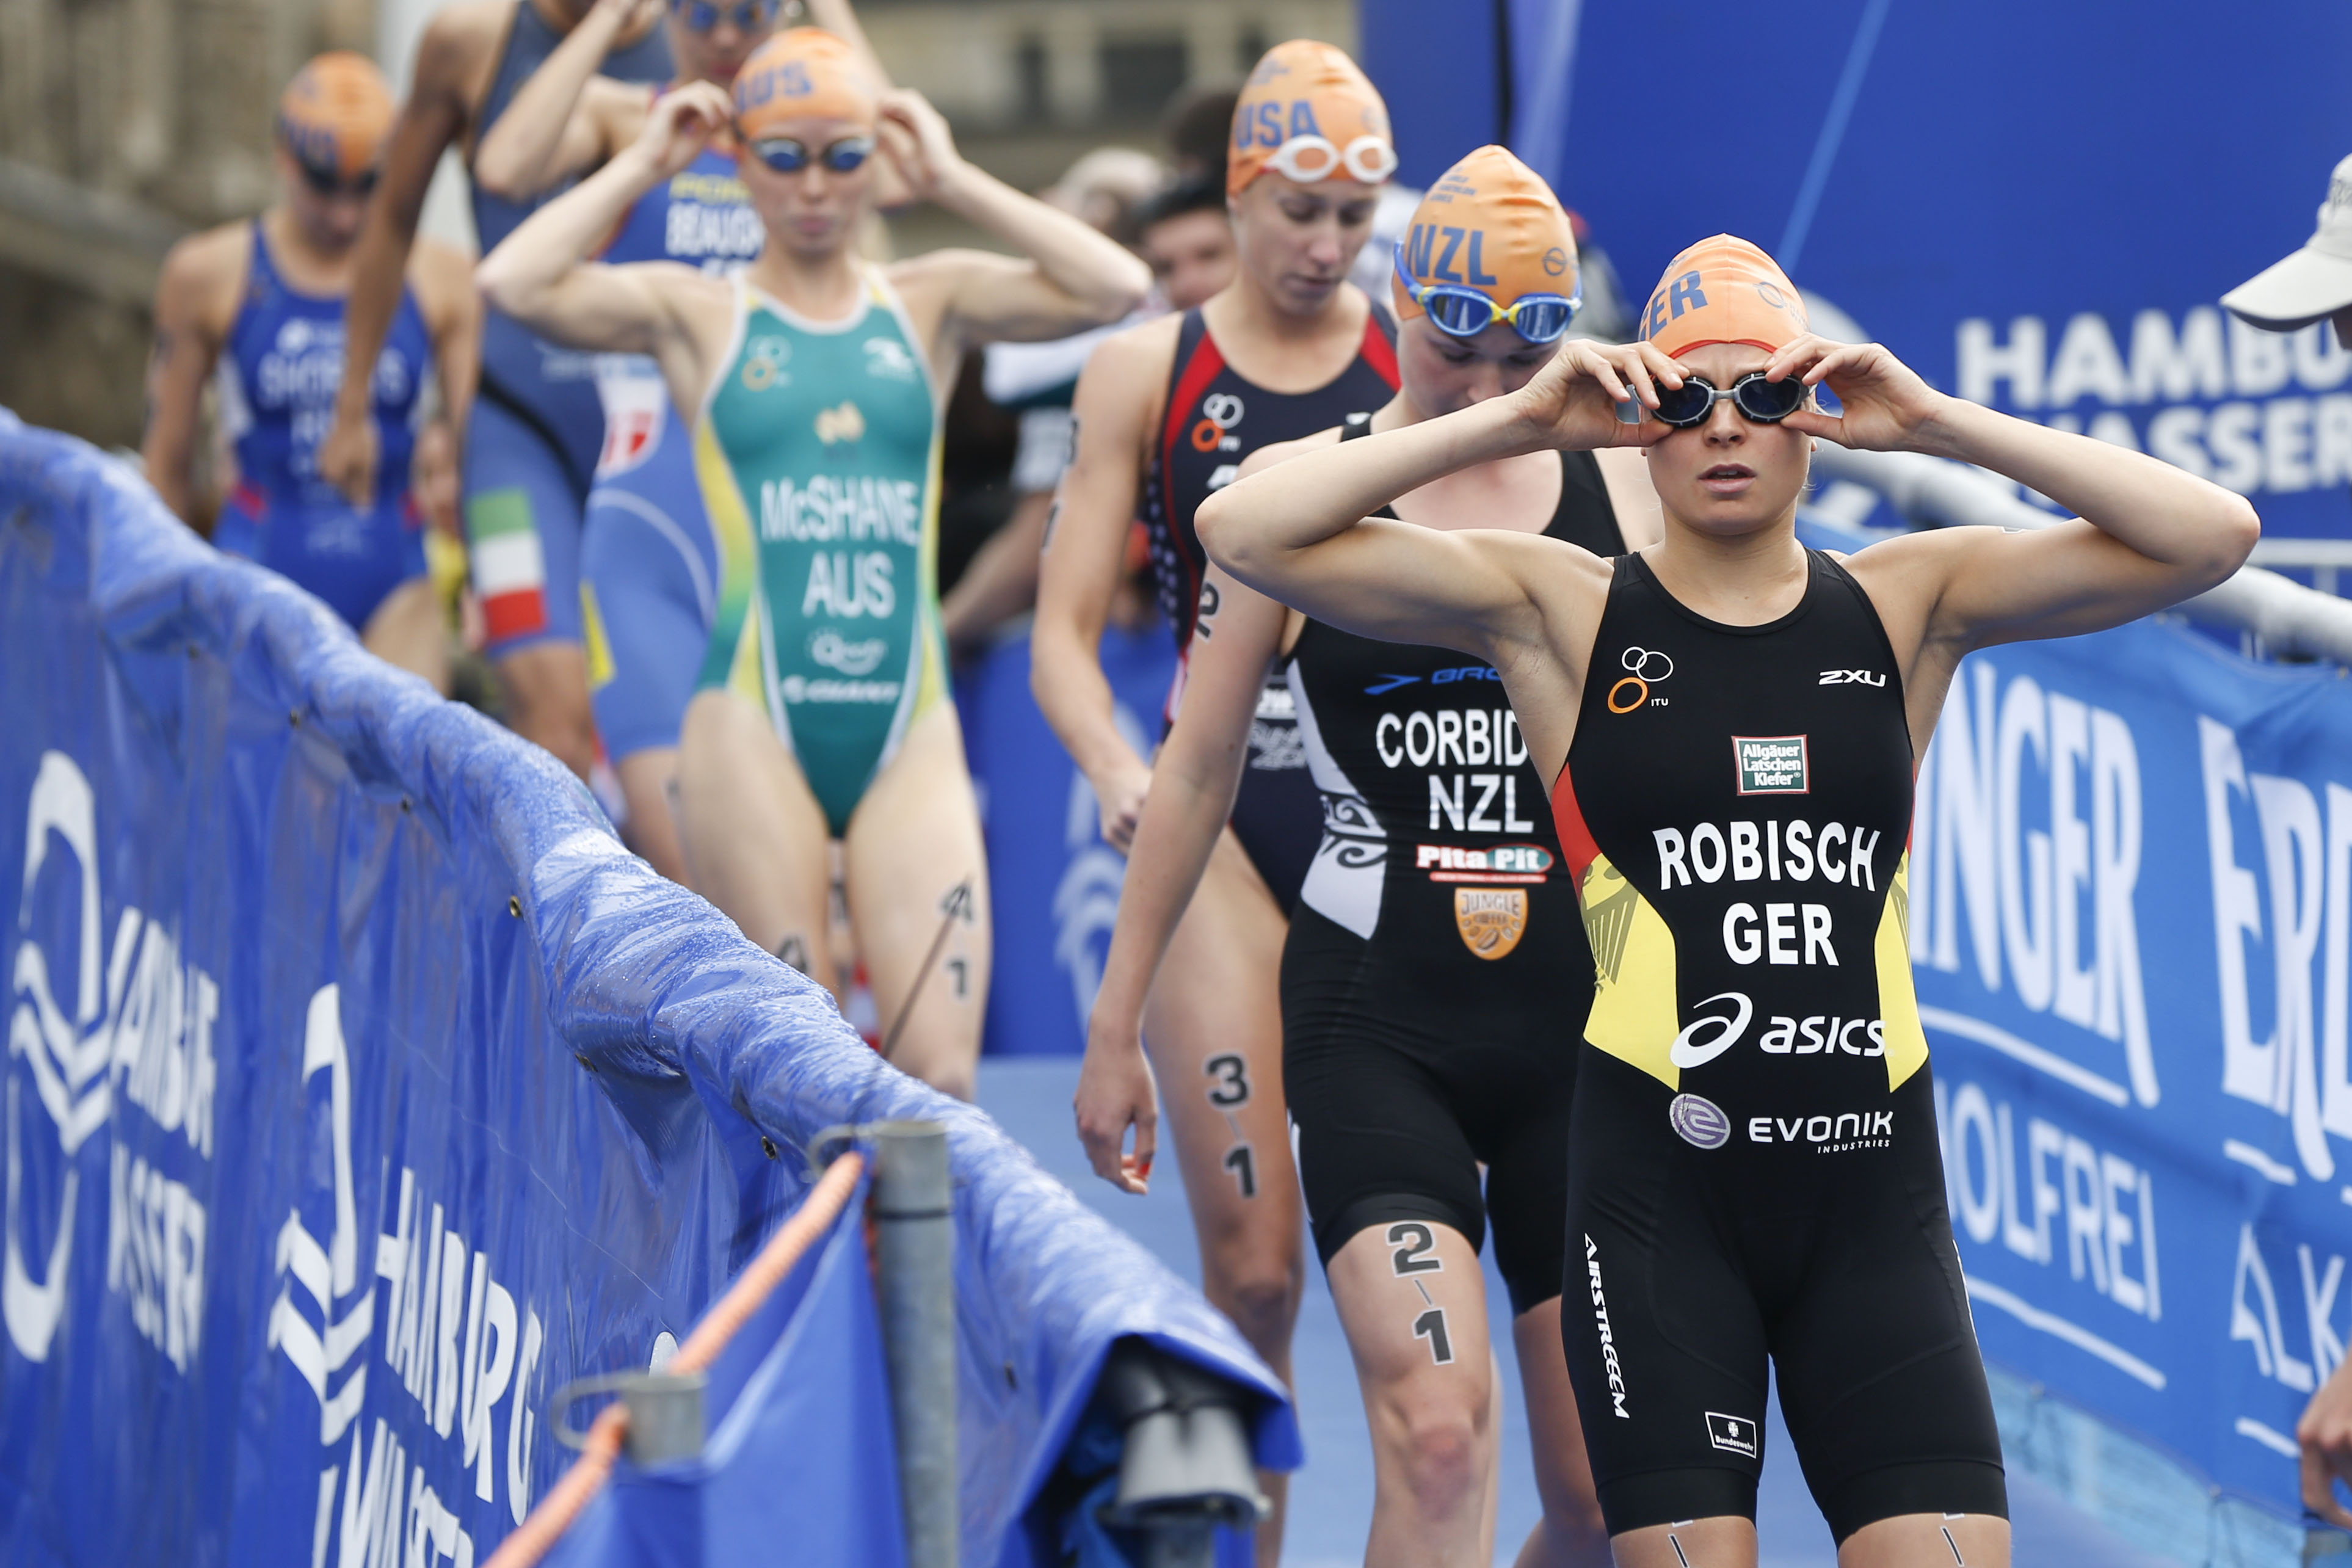 CSV-TRI-Team: ITU World Triathlon Hamburg williamhill sh bonus